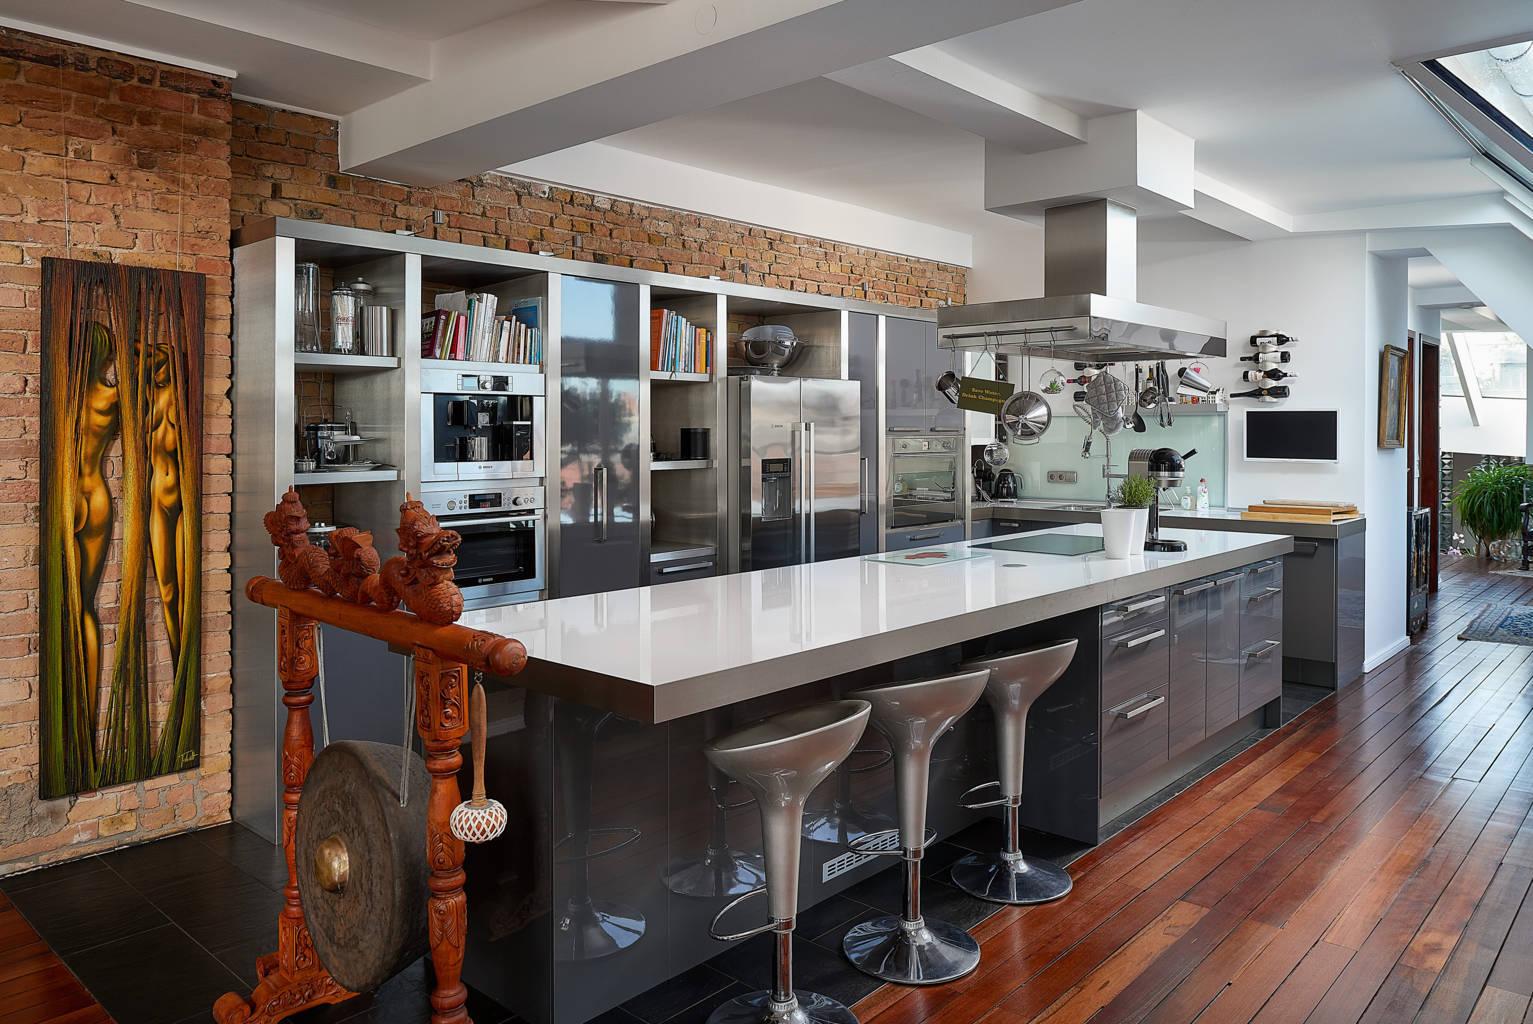 immobilienfotografie thomas stibenz berlin kreuzberg k che edelstahl thomas stibenz. Black Bedroom Furniture Sets. Home Design Ideas